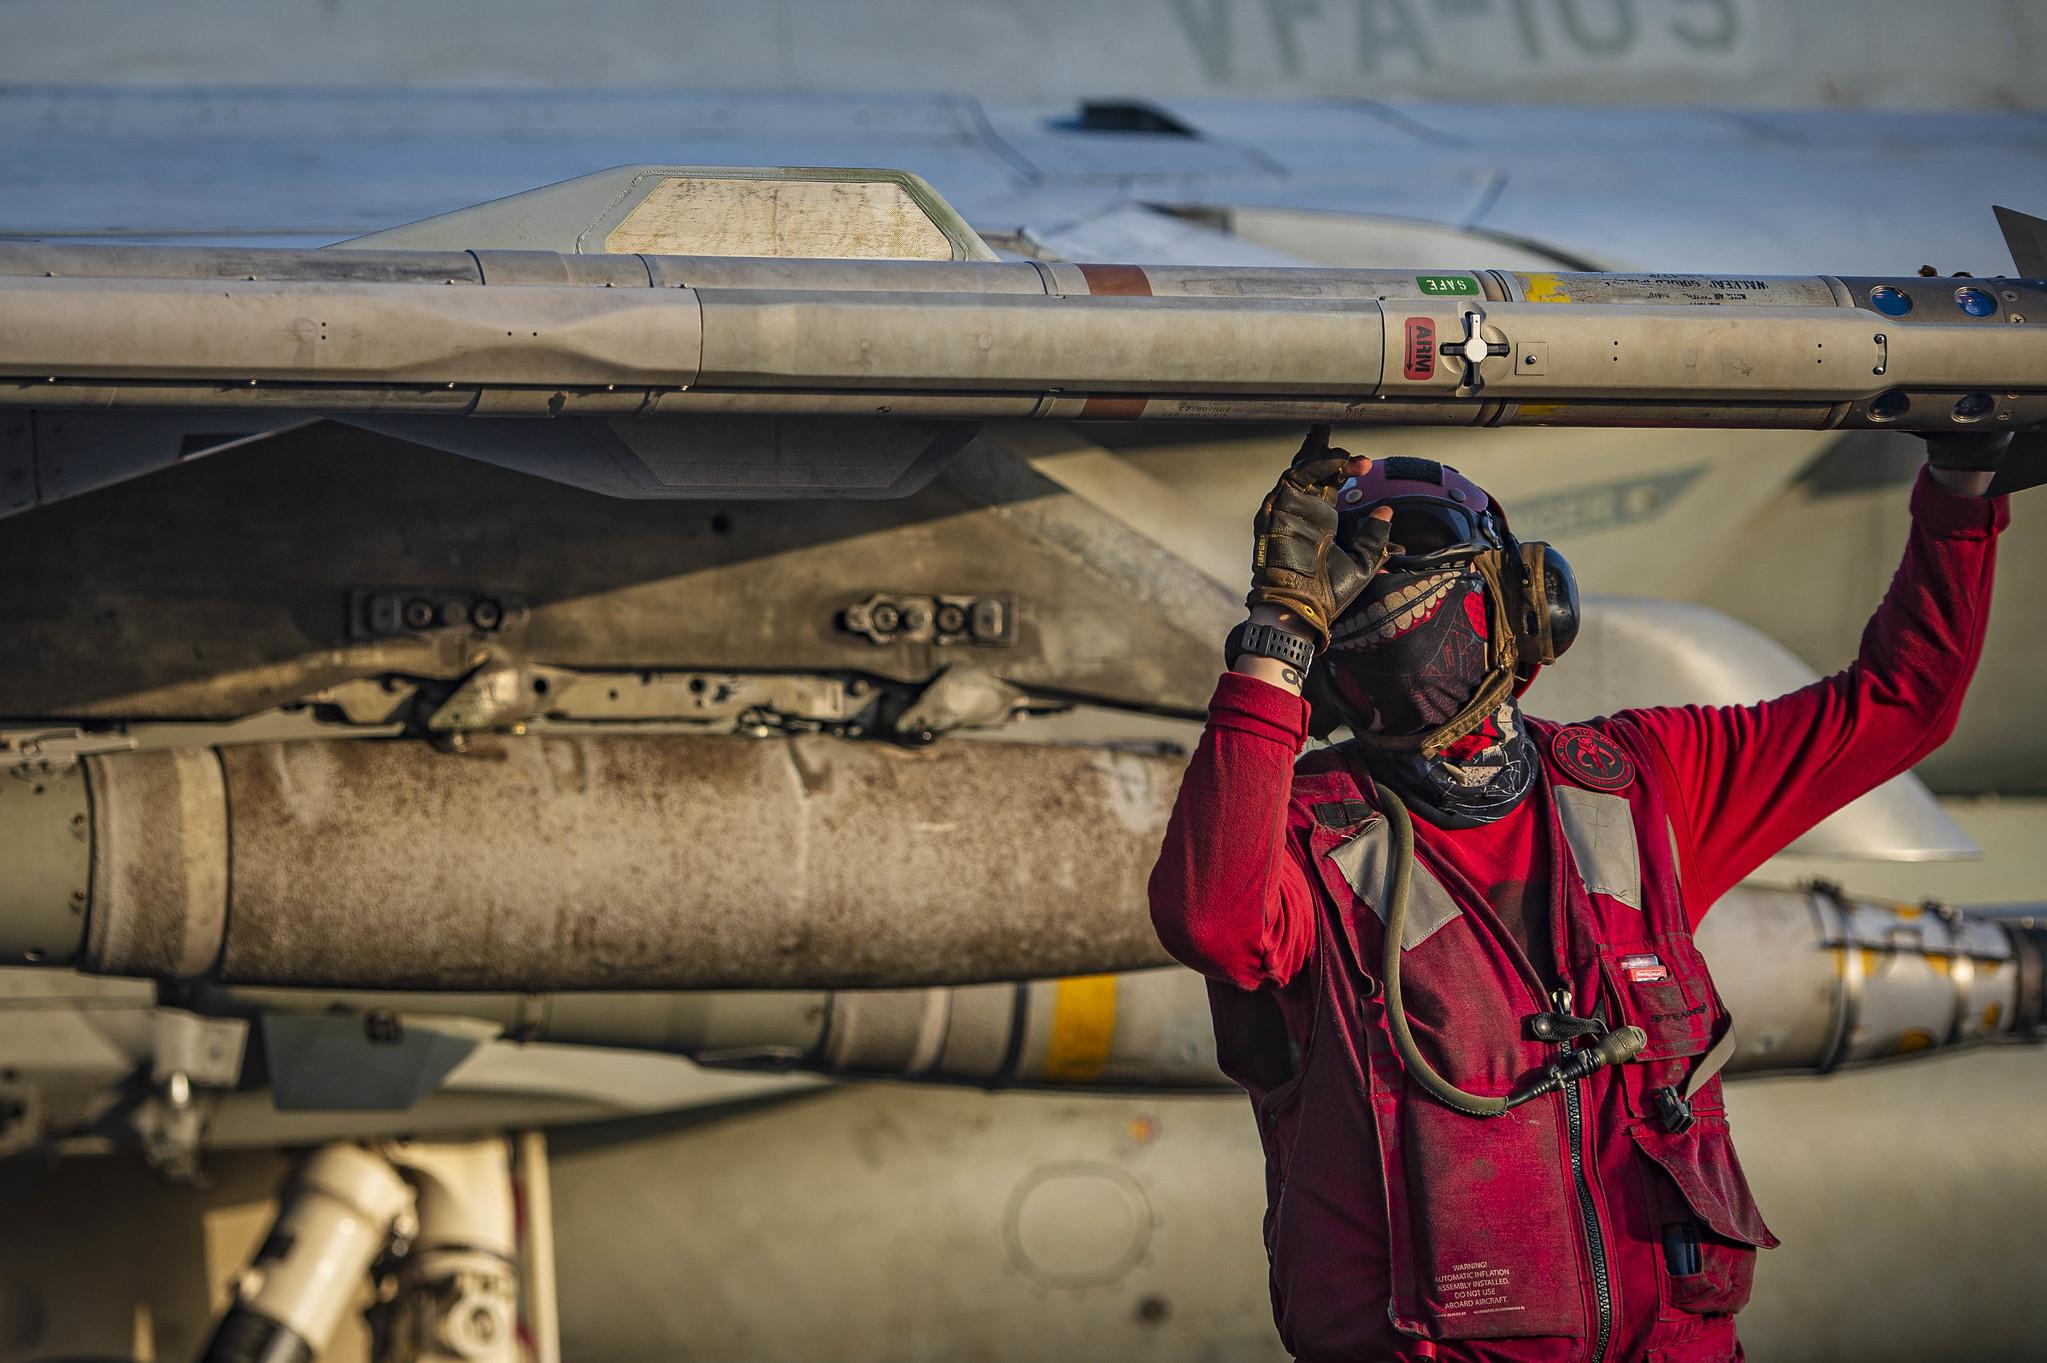 Aviation Ordnanceman Airman Ethan Sauer performs pre-flight ordnance checks on a F/A-18E Super Hornet on May 4, 20121, during flight operations aboard aircraft carrier USS Dwight D. Eisenhower (CVN 69) in the Arabian Sea. (Mass Communication Specialist Seaman Mo Bourdi/Navy)